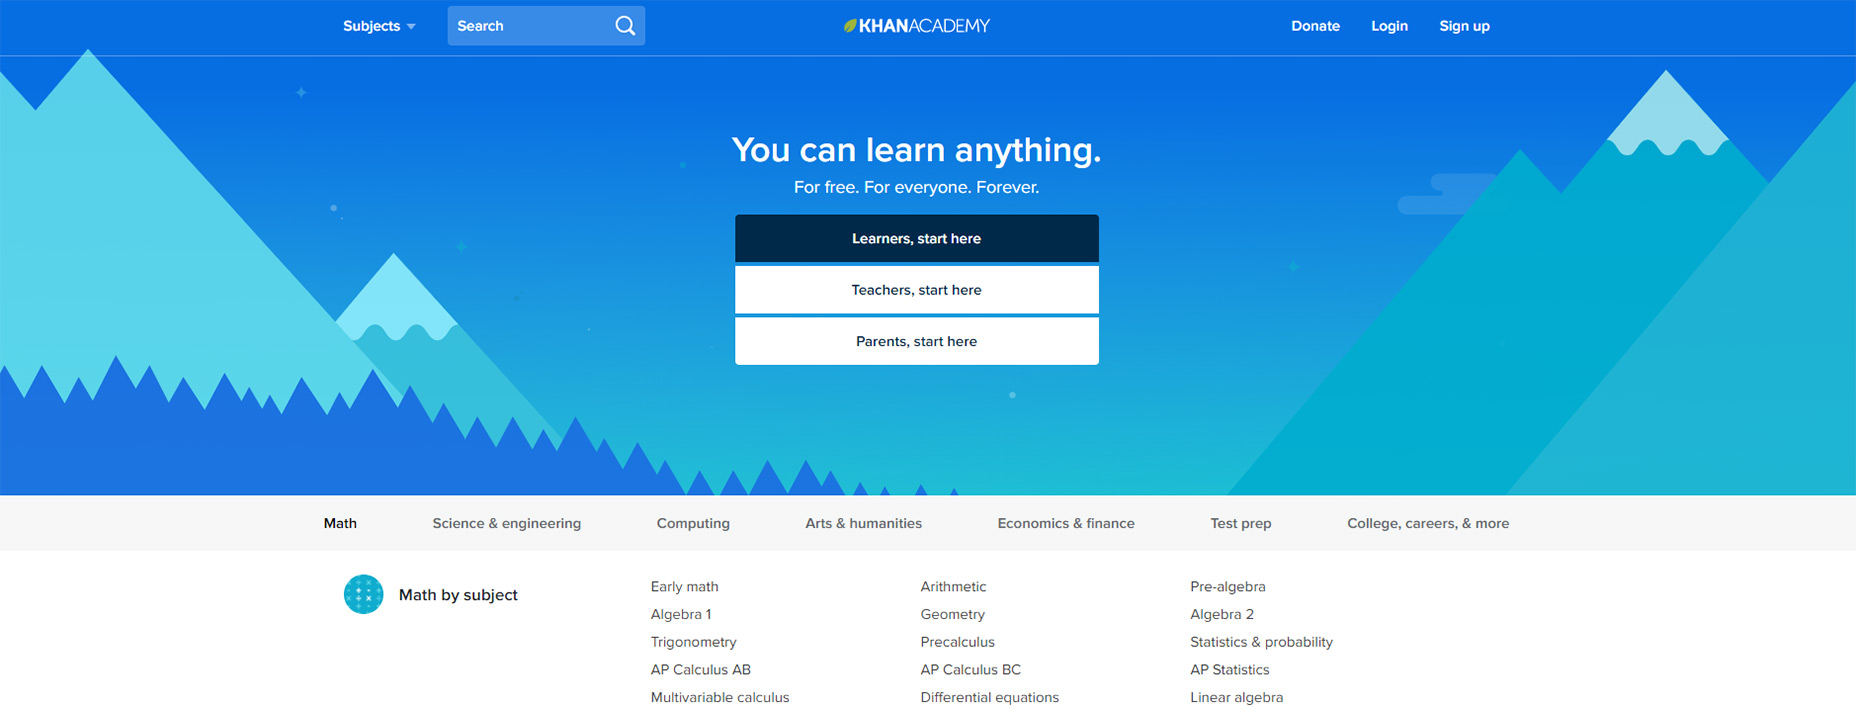 09-khan-akademie-homepage